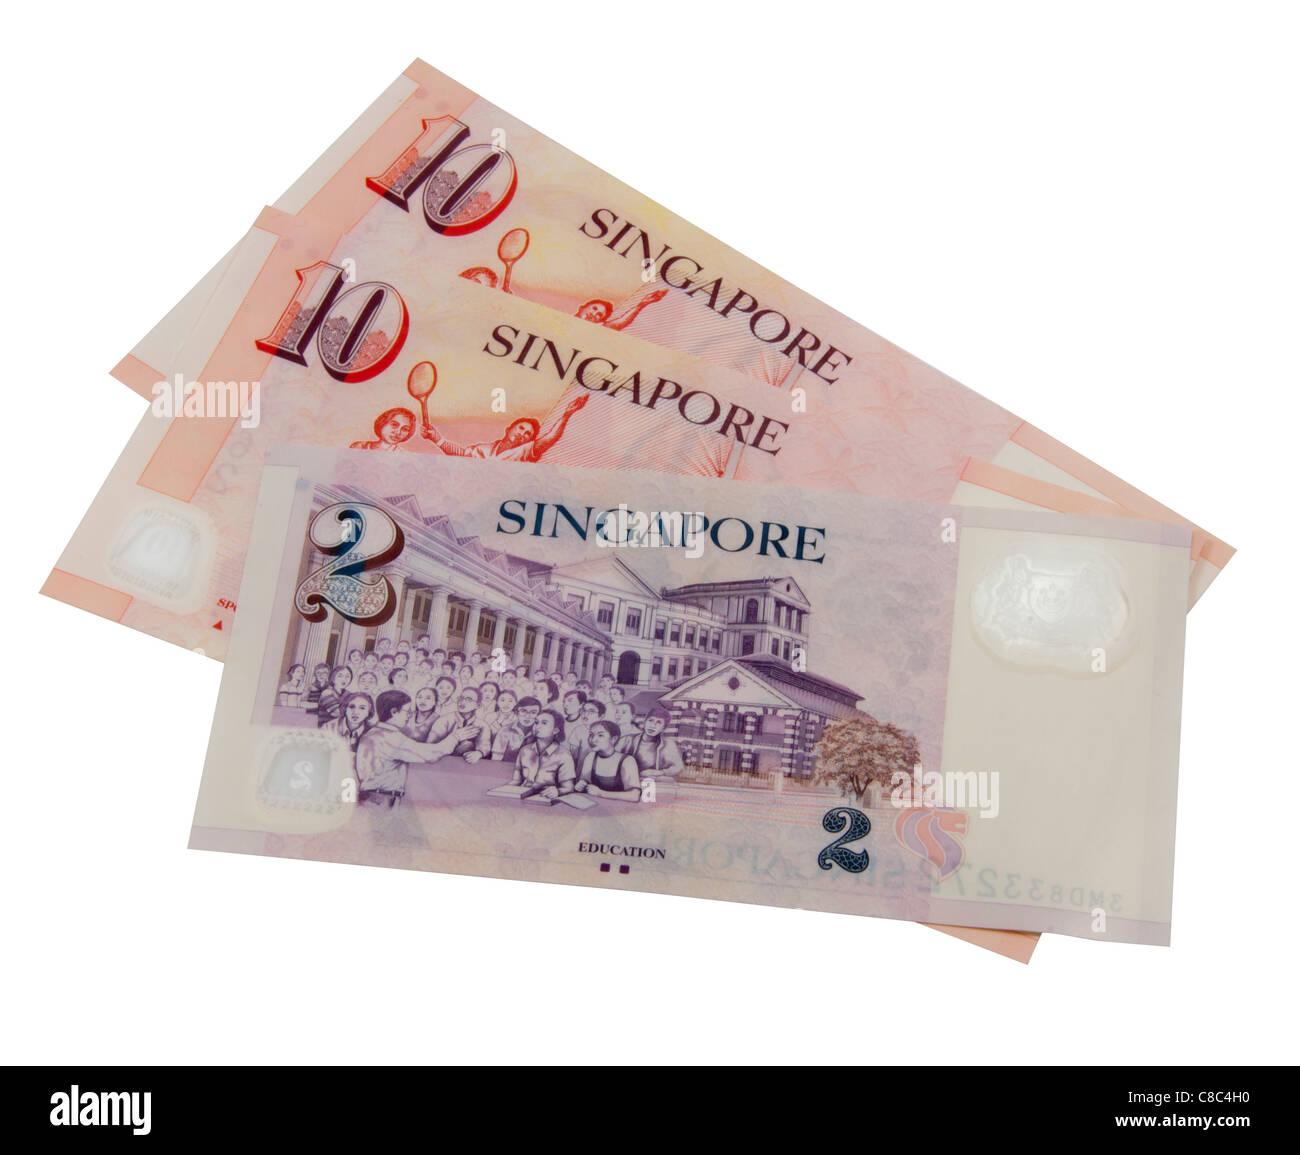 Singapore Dollar Notes - Stock Image